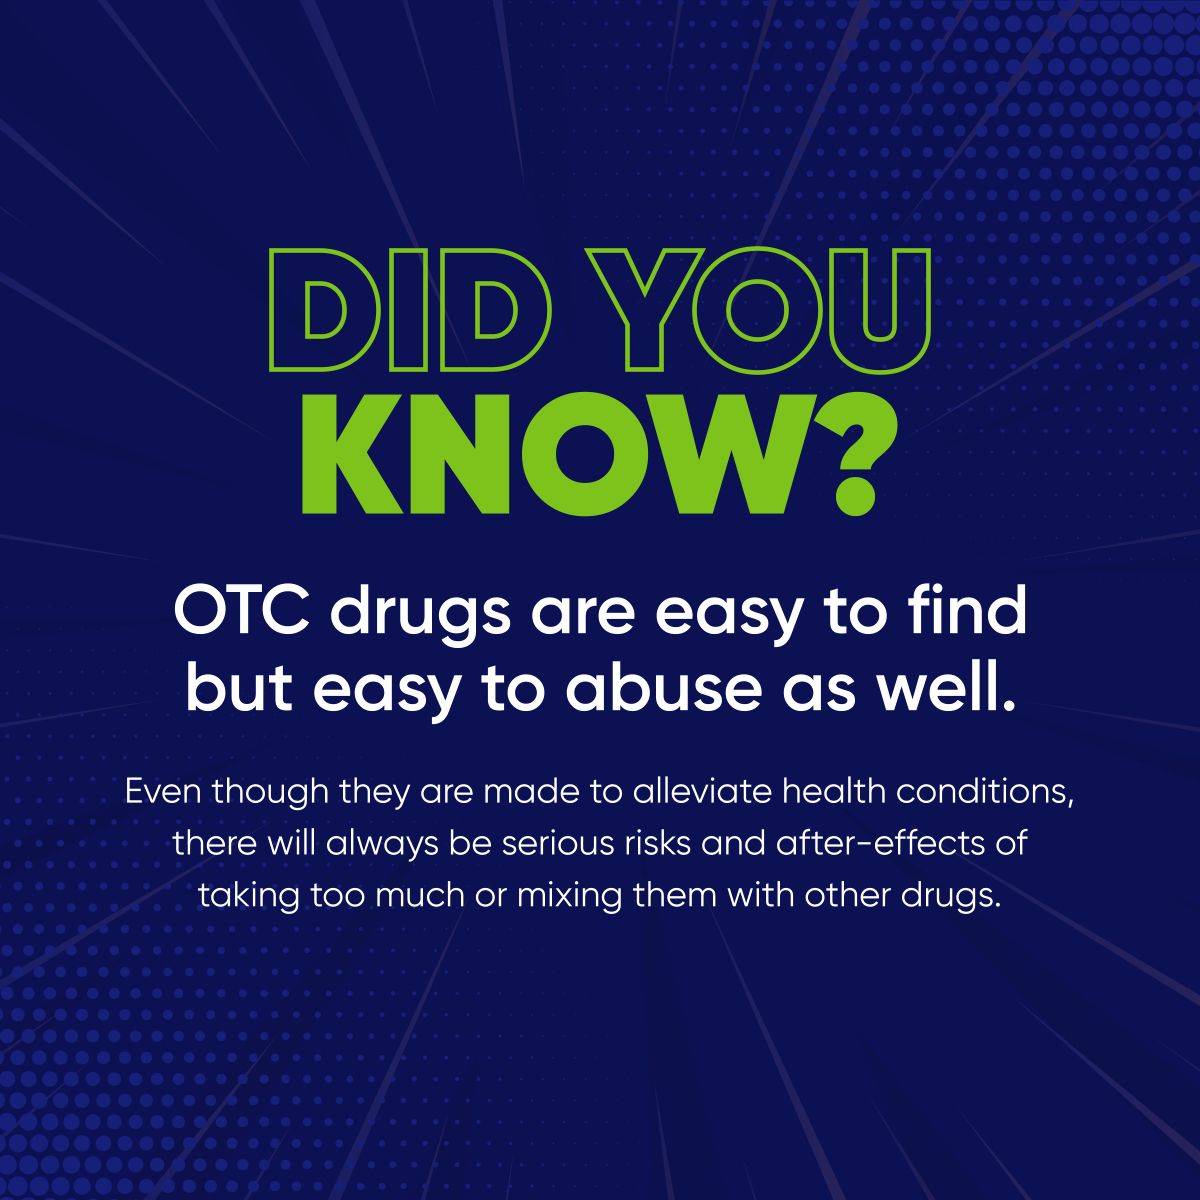 Did You Know? OTCDrugs SaveNCarePharmacy in 2020